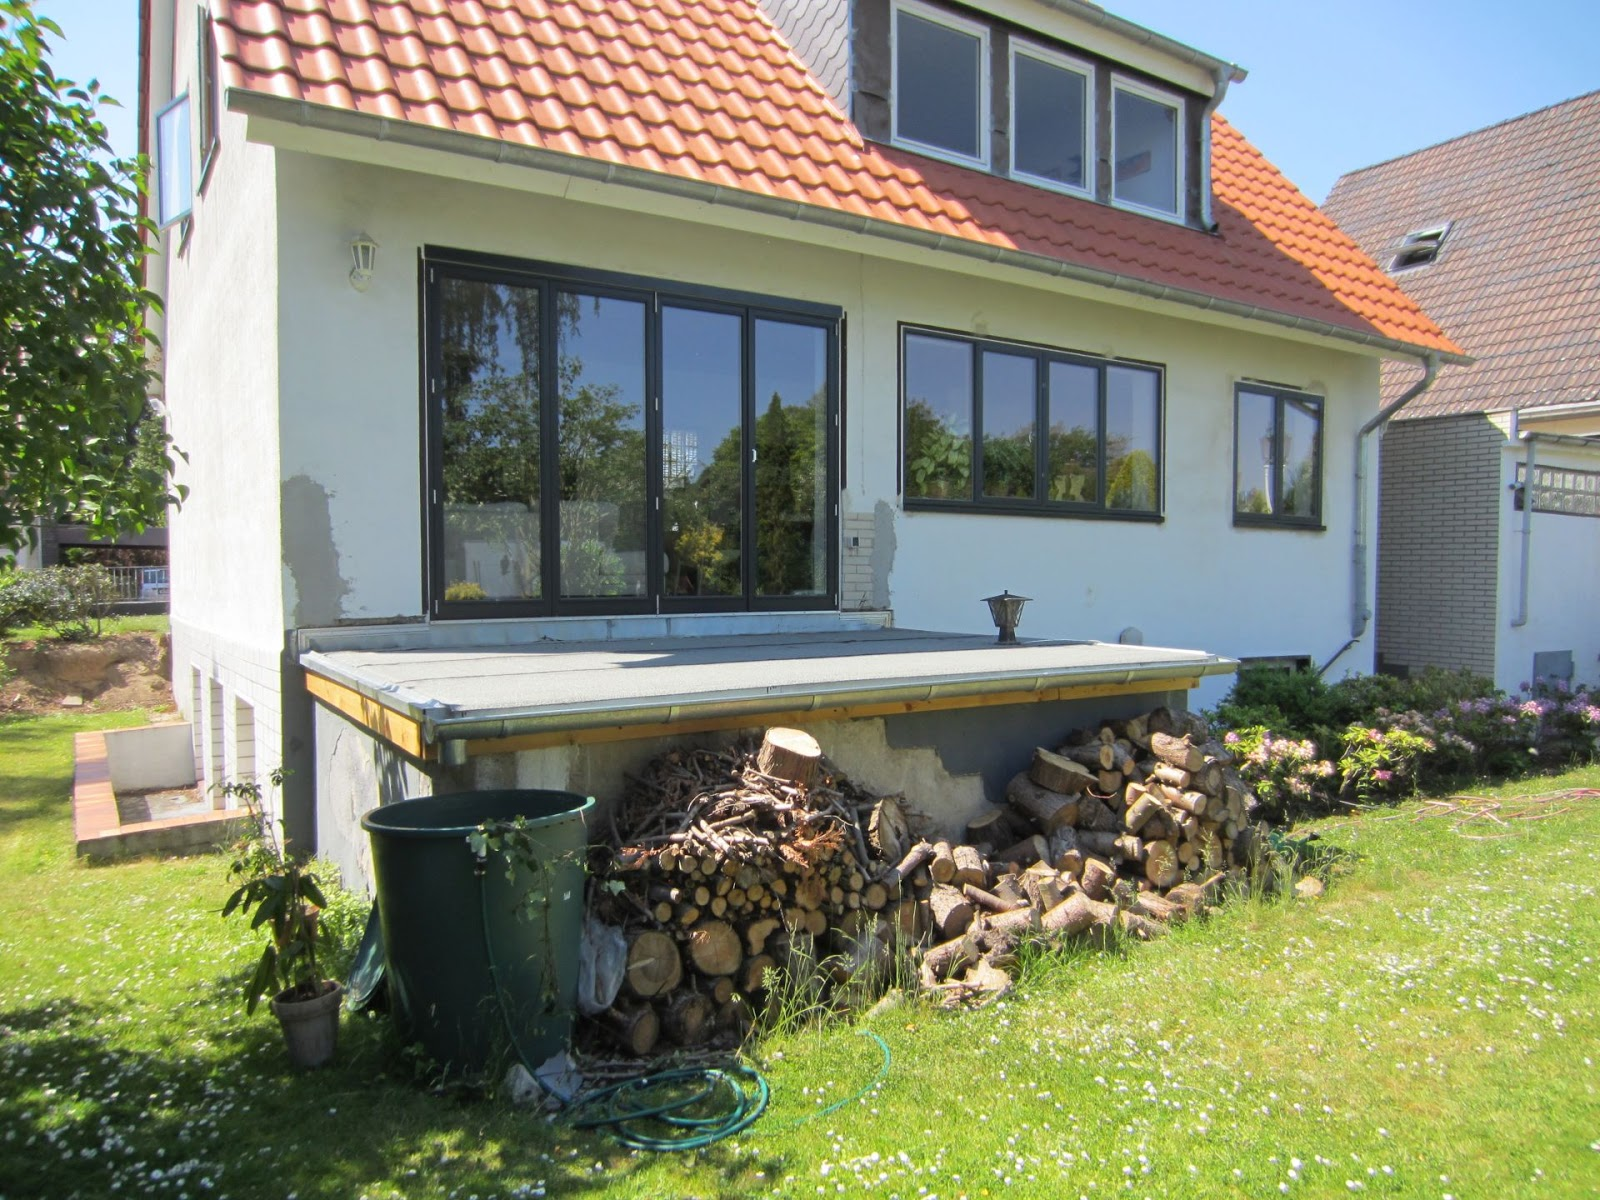 Terrasse Aus Stahl terrasse aus stahl mit holzbelag fröbel metallbau